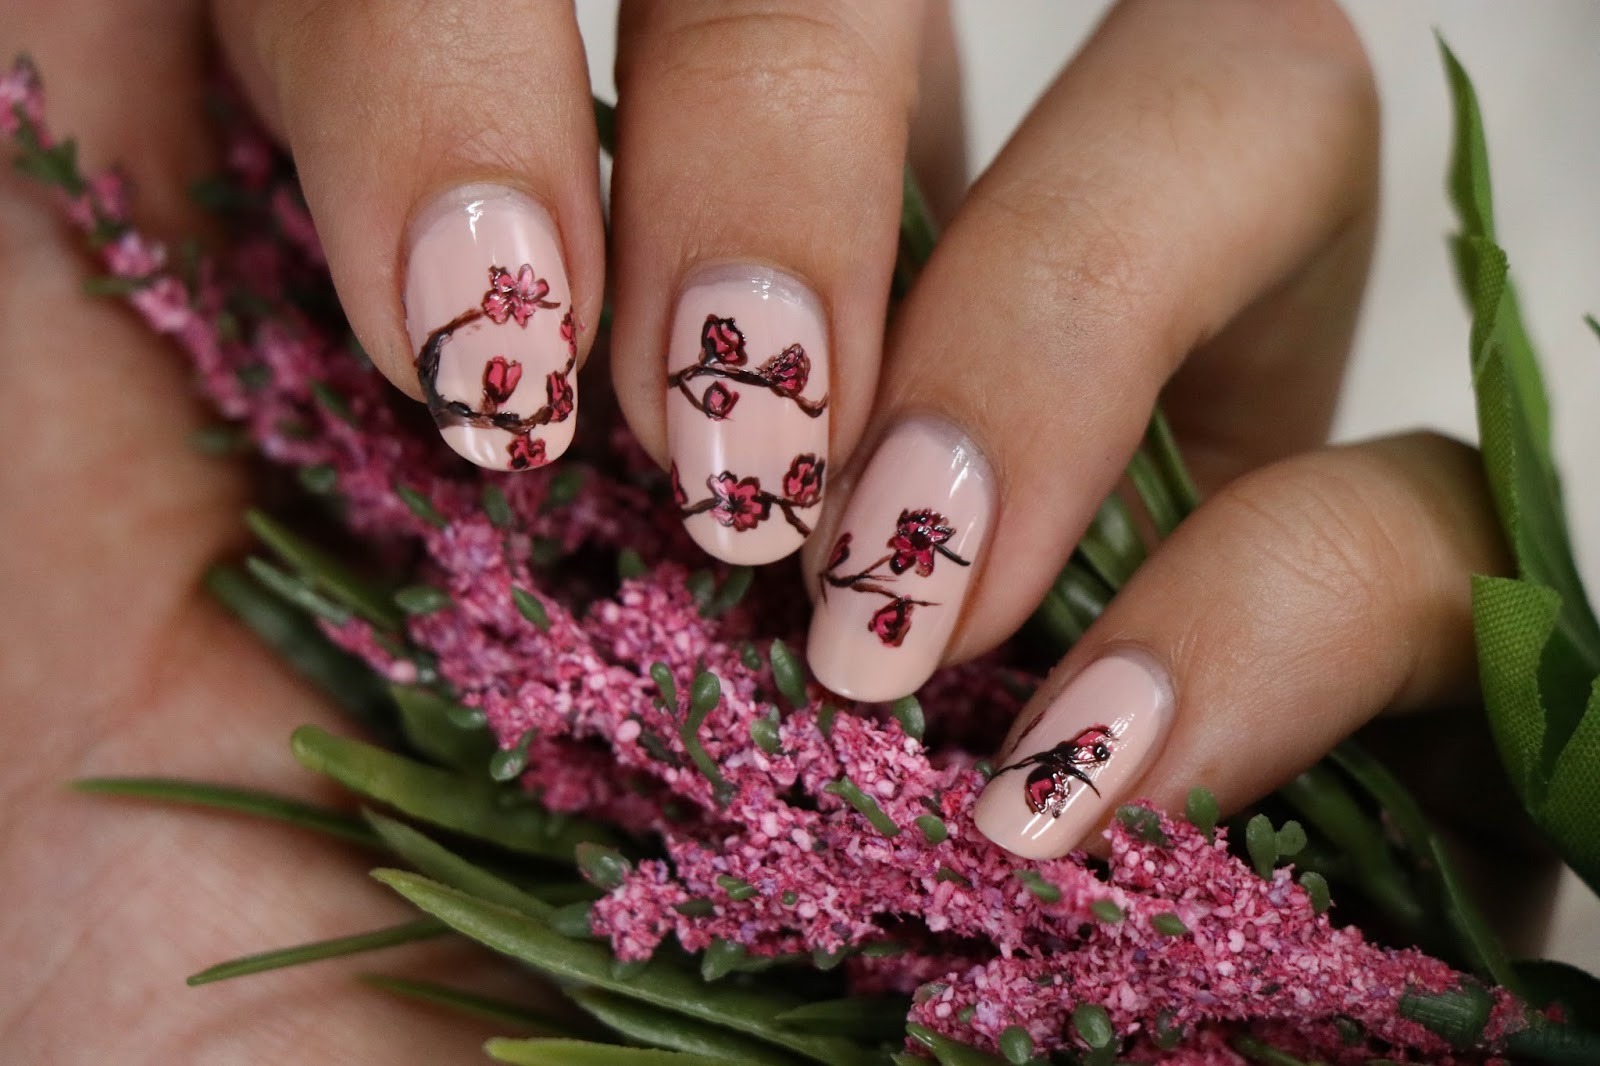 Cherry Blossom Nail Art 🌸 - JACKIEMONTT